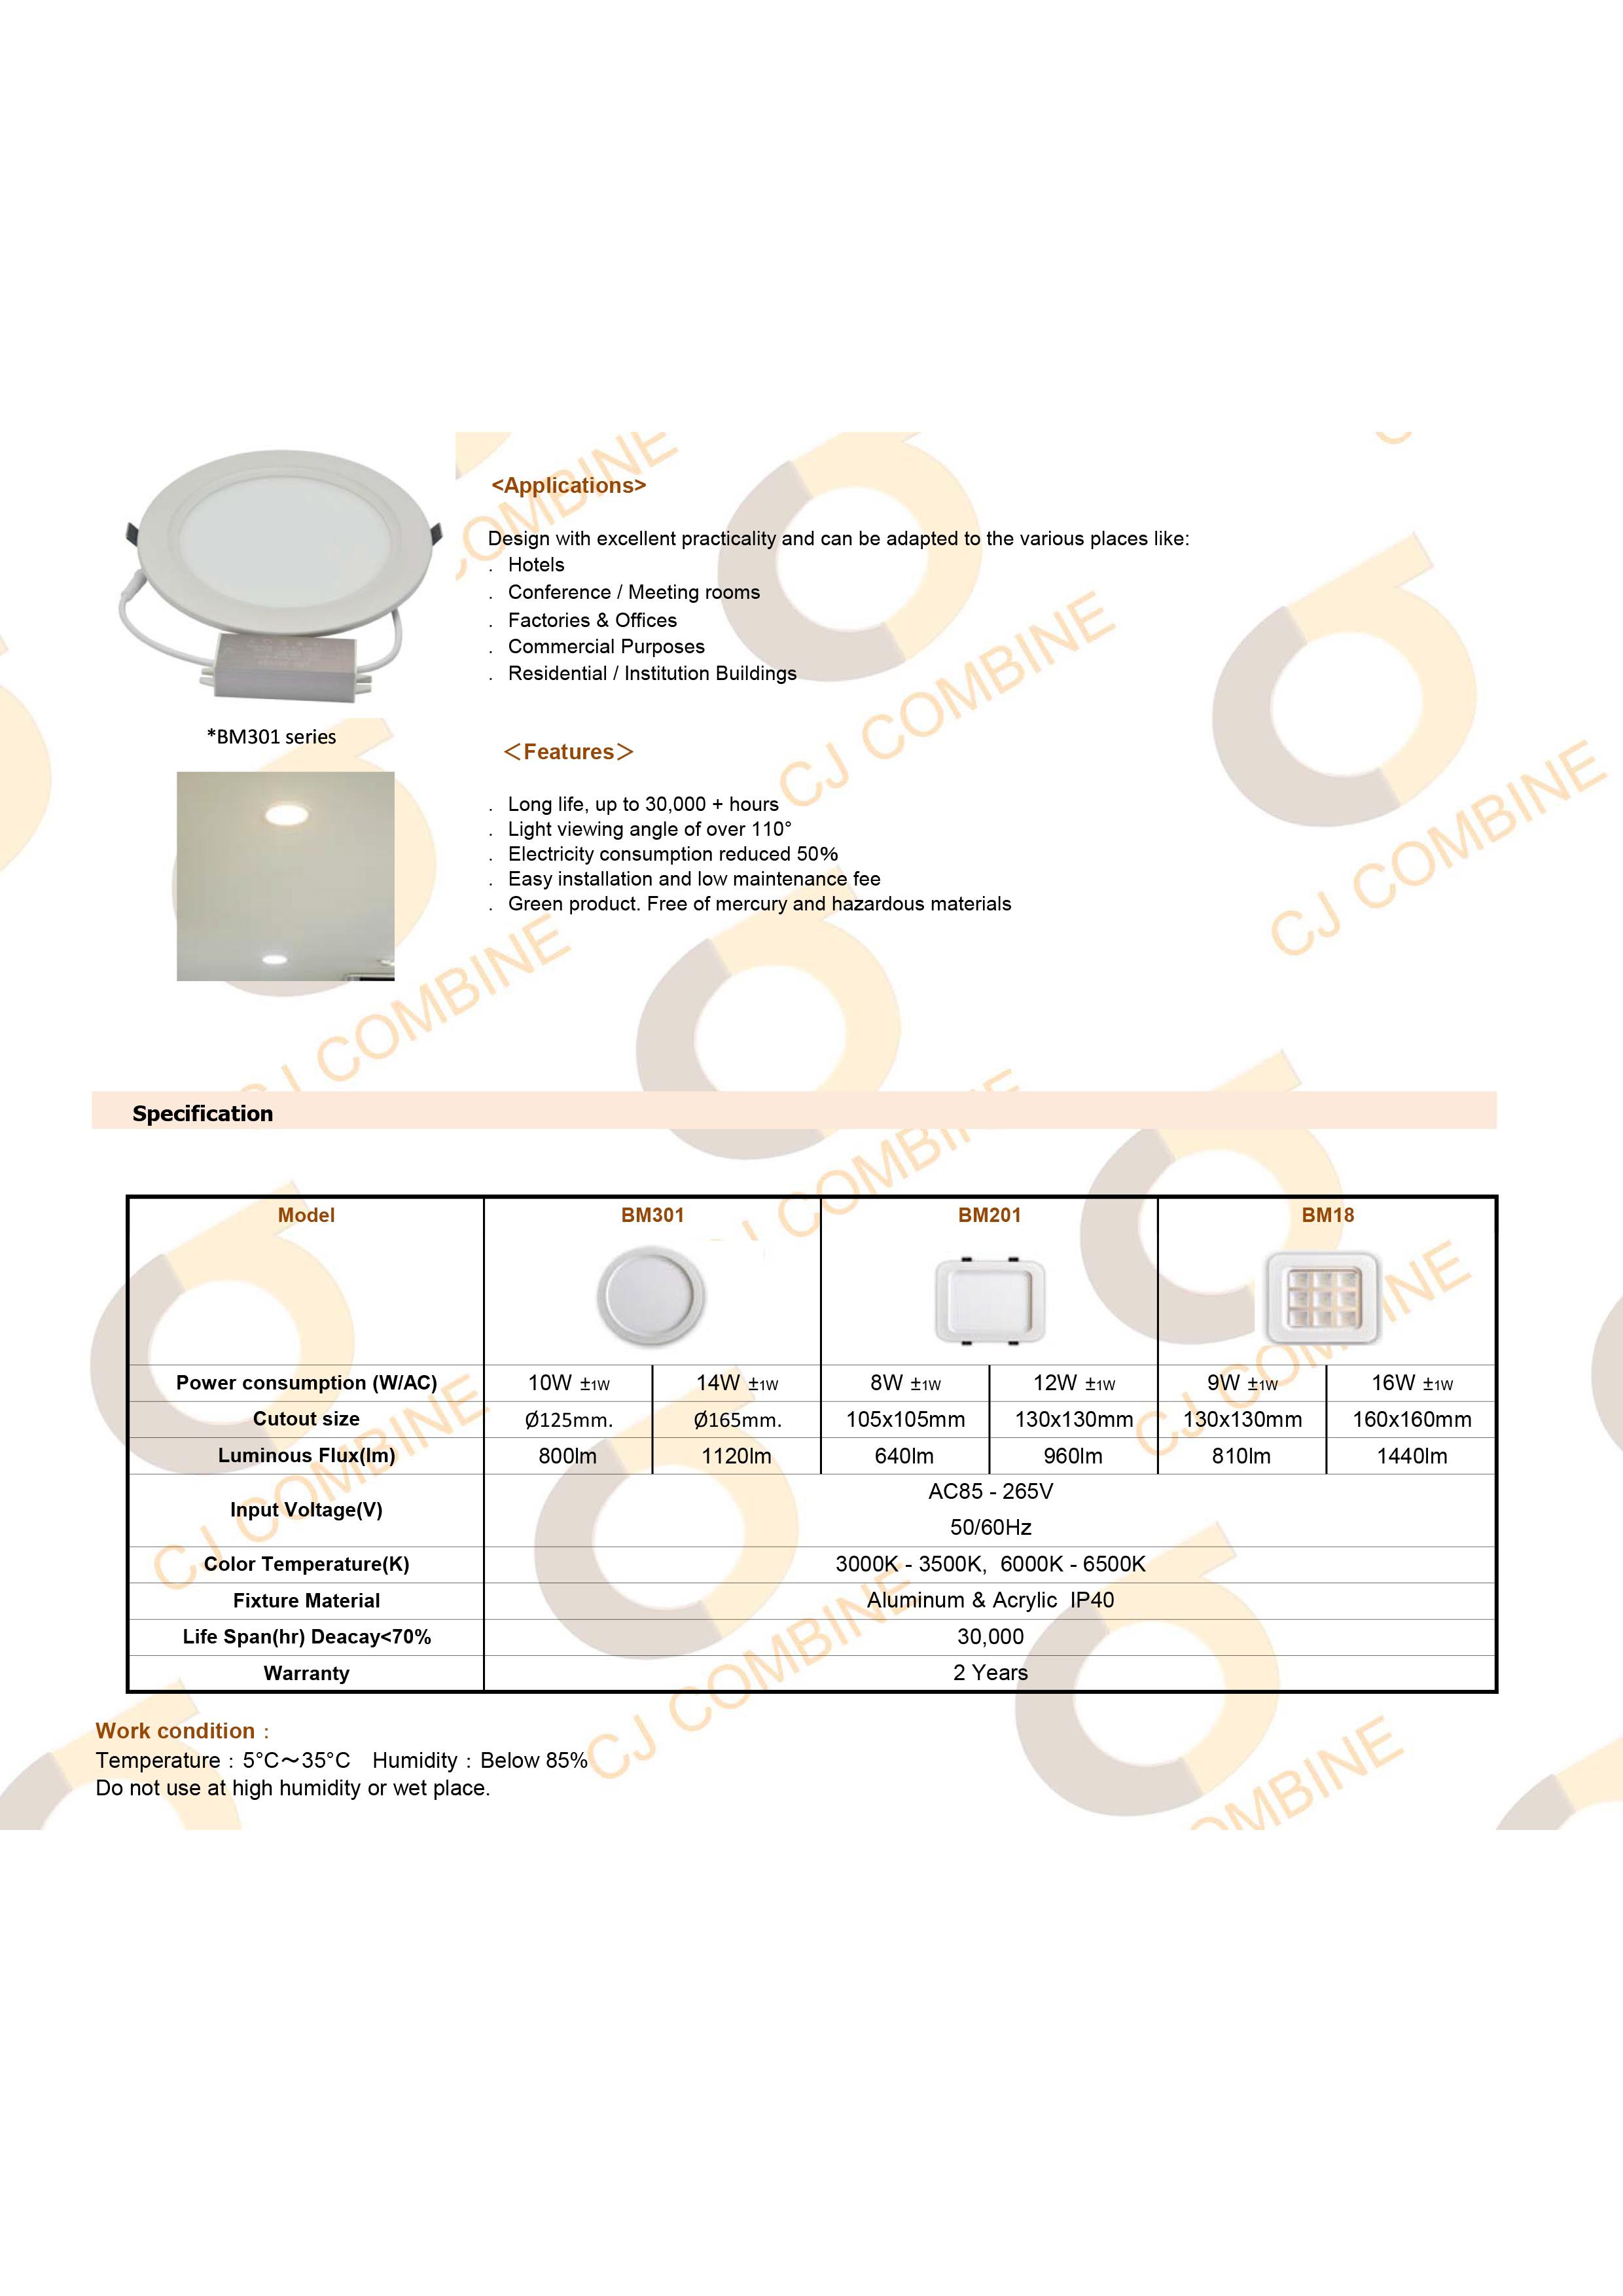 iled , iLED , led , LED , downlight , down light , mr16 , MR16 , mr 16 , โคม , โคมฝังฝ้า , โคมติดลอย , หลอดประหยัดไฟ , หลอดแอลอีดี